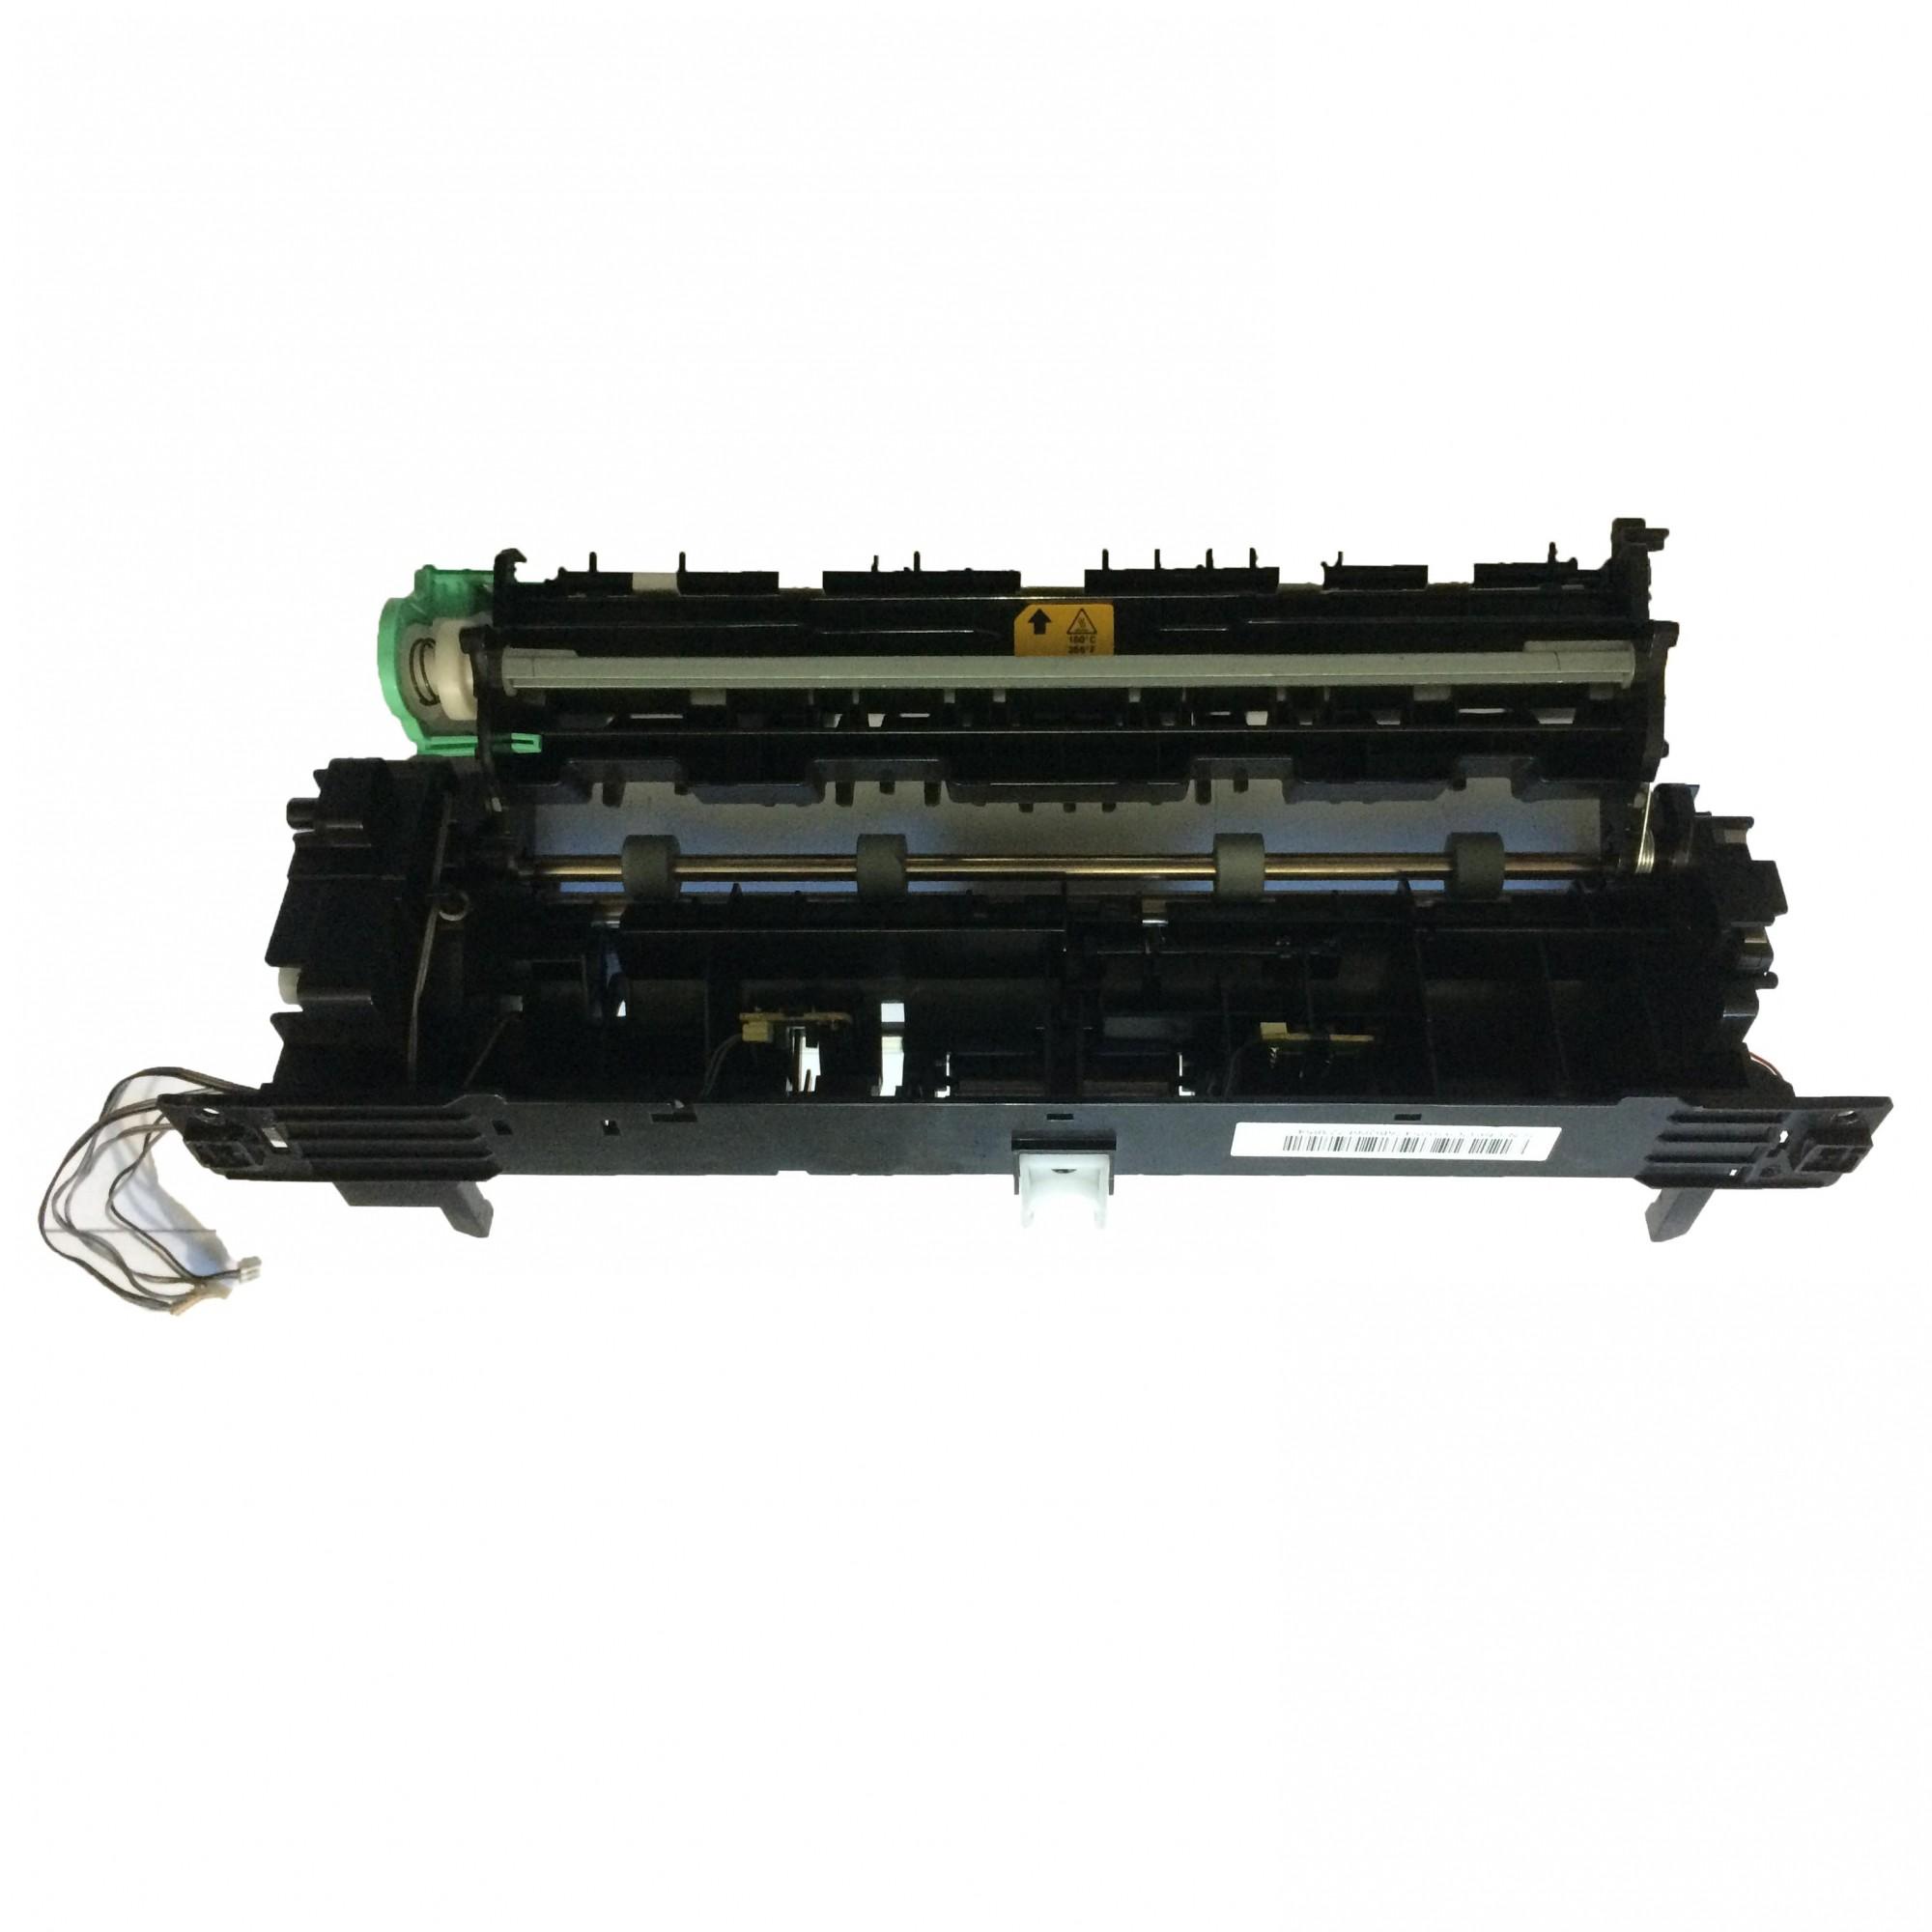 Tracionador Completo Multifuncional Samsung Xpress C410w Sl-c460fw Clp365w PN: jc61-05656a - Retirado